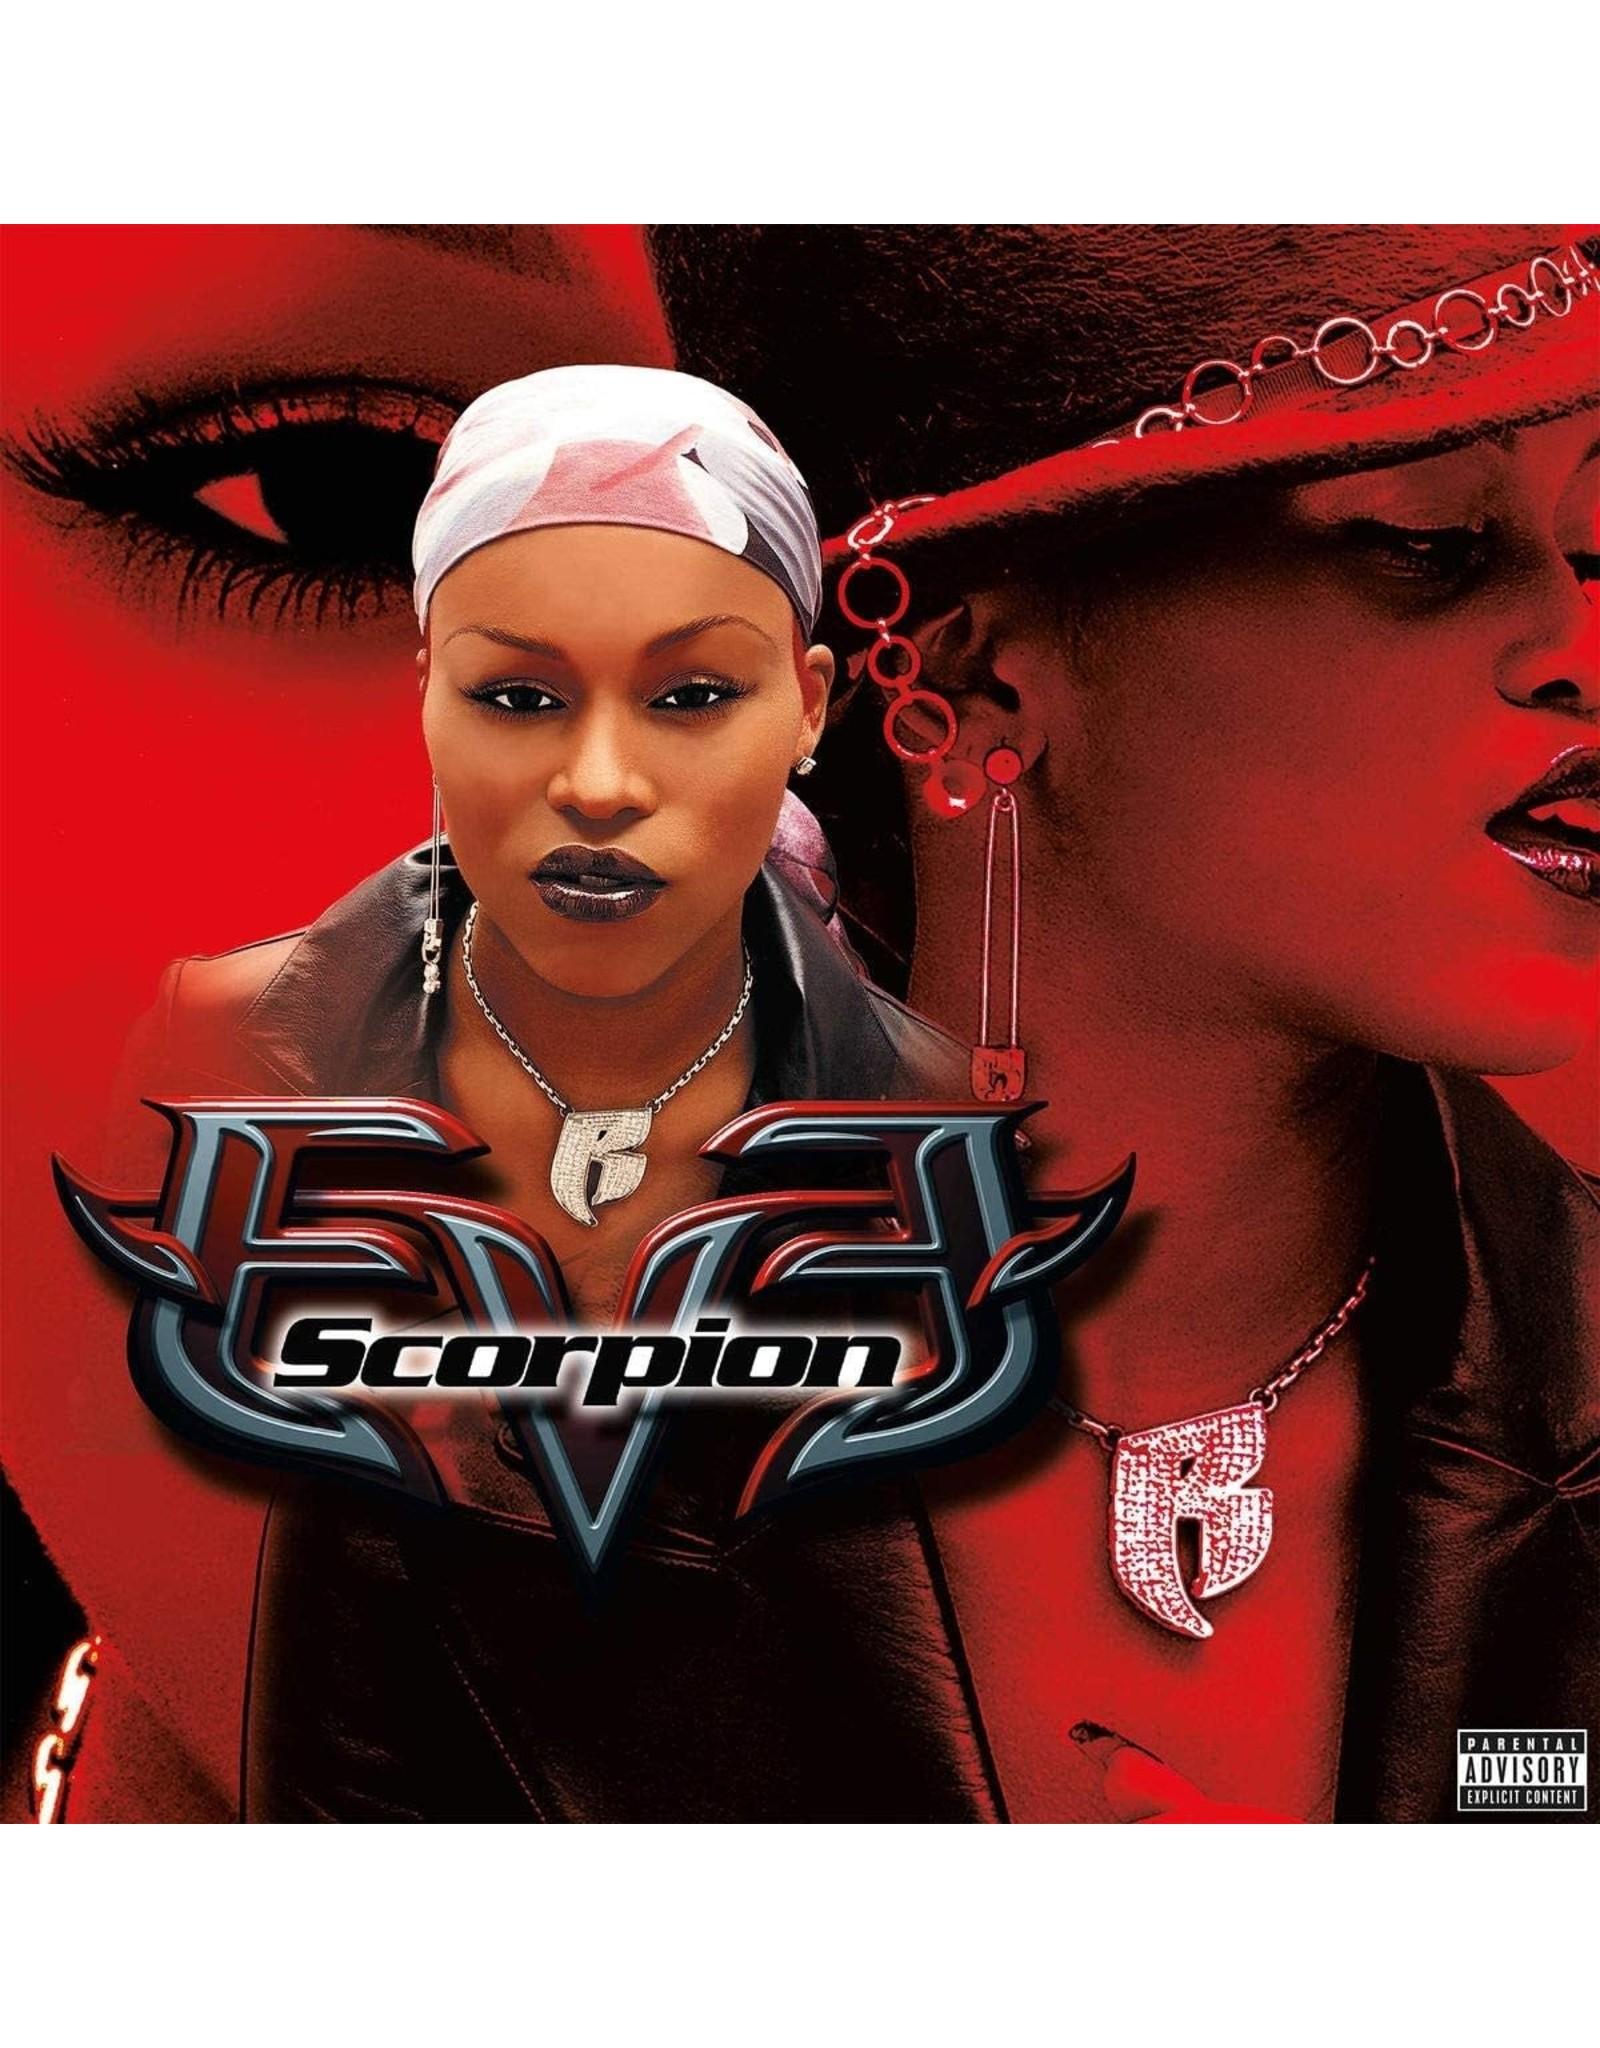 Eve - Scorpion (20th Anniversary)